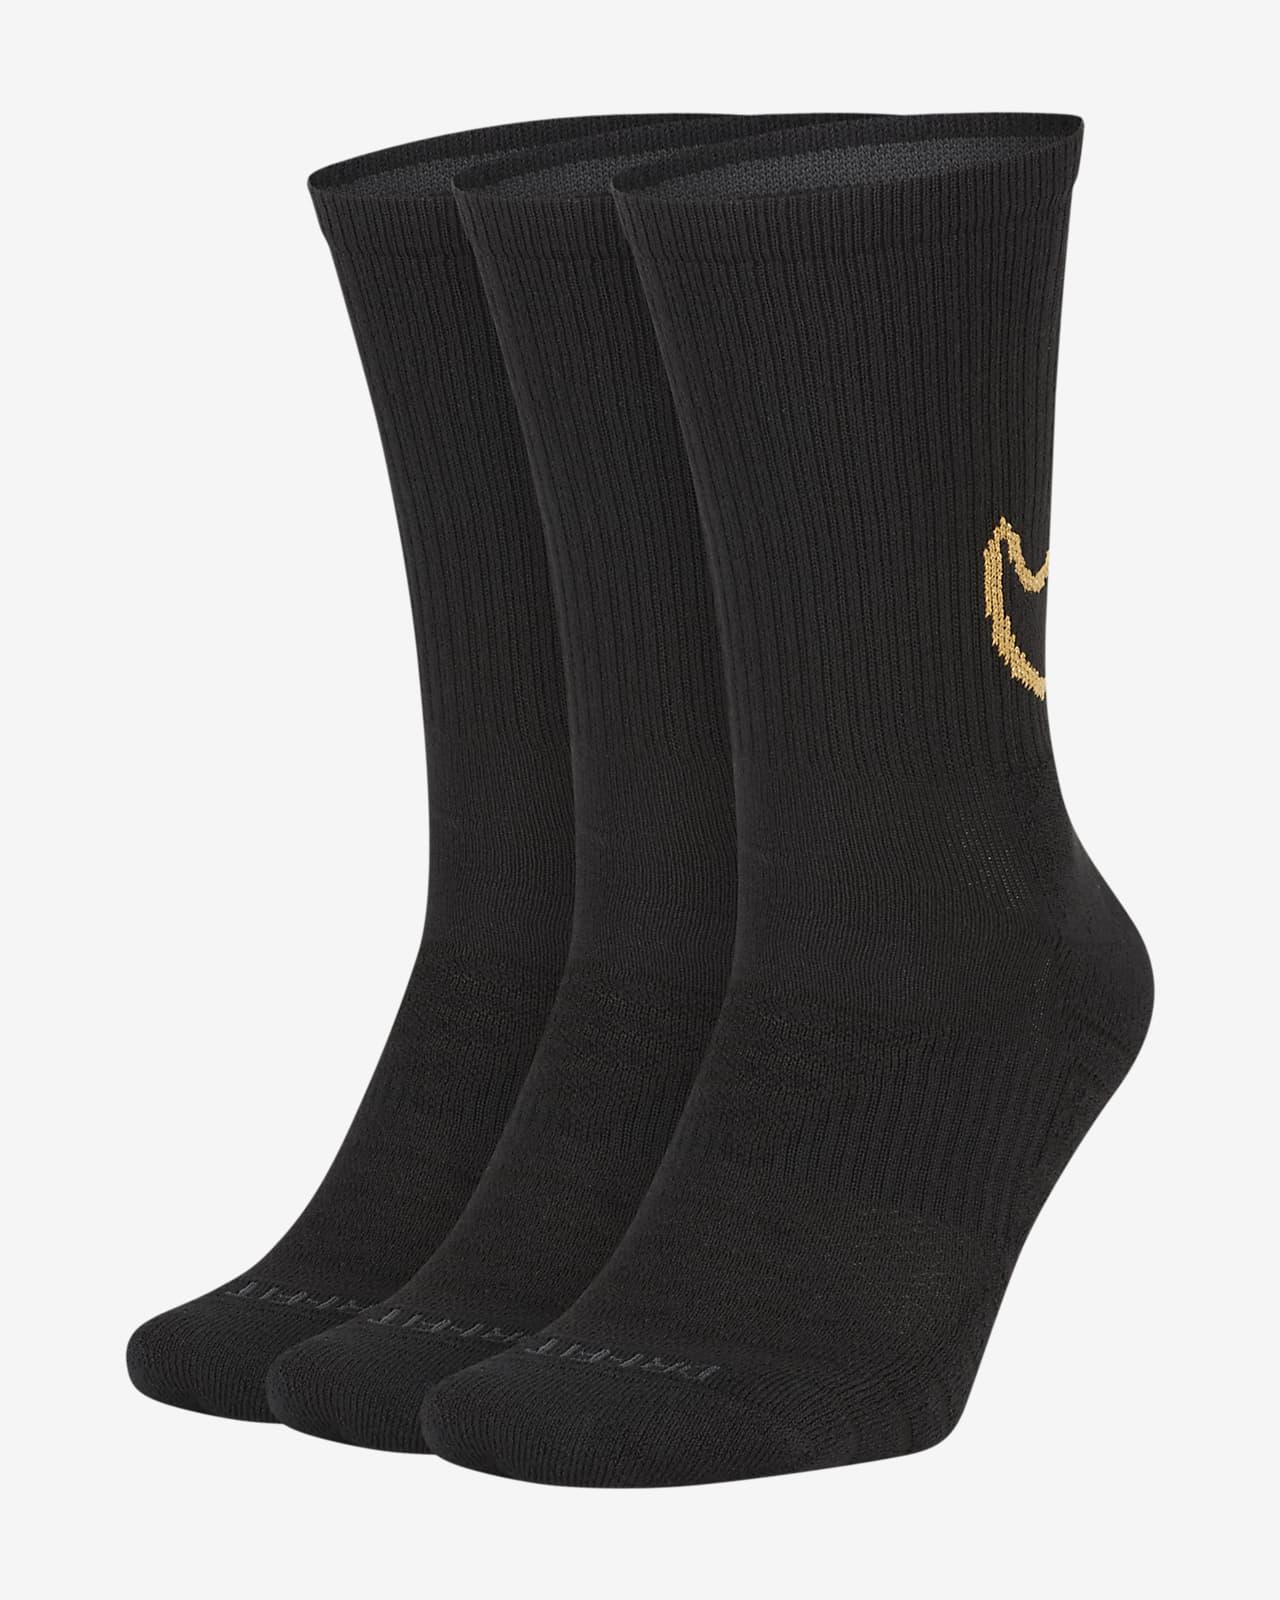 Nike Everyday Max Cushioned Crew Training Socks (3 Pairs)